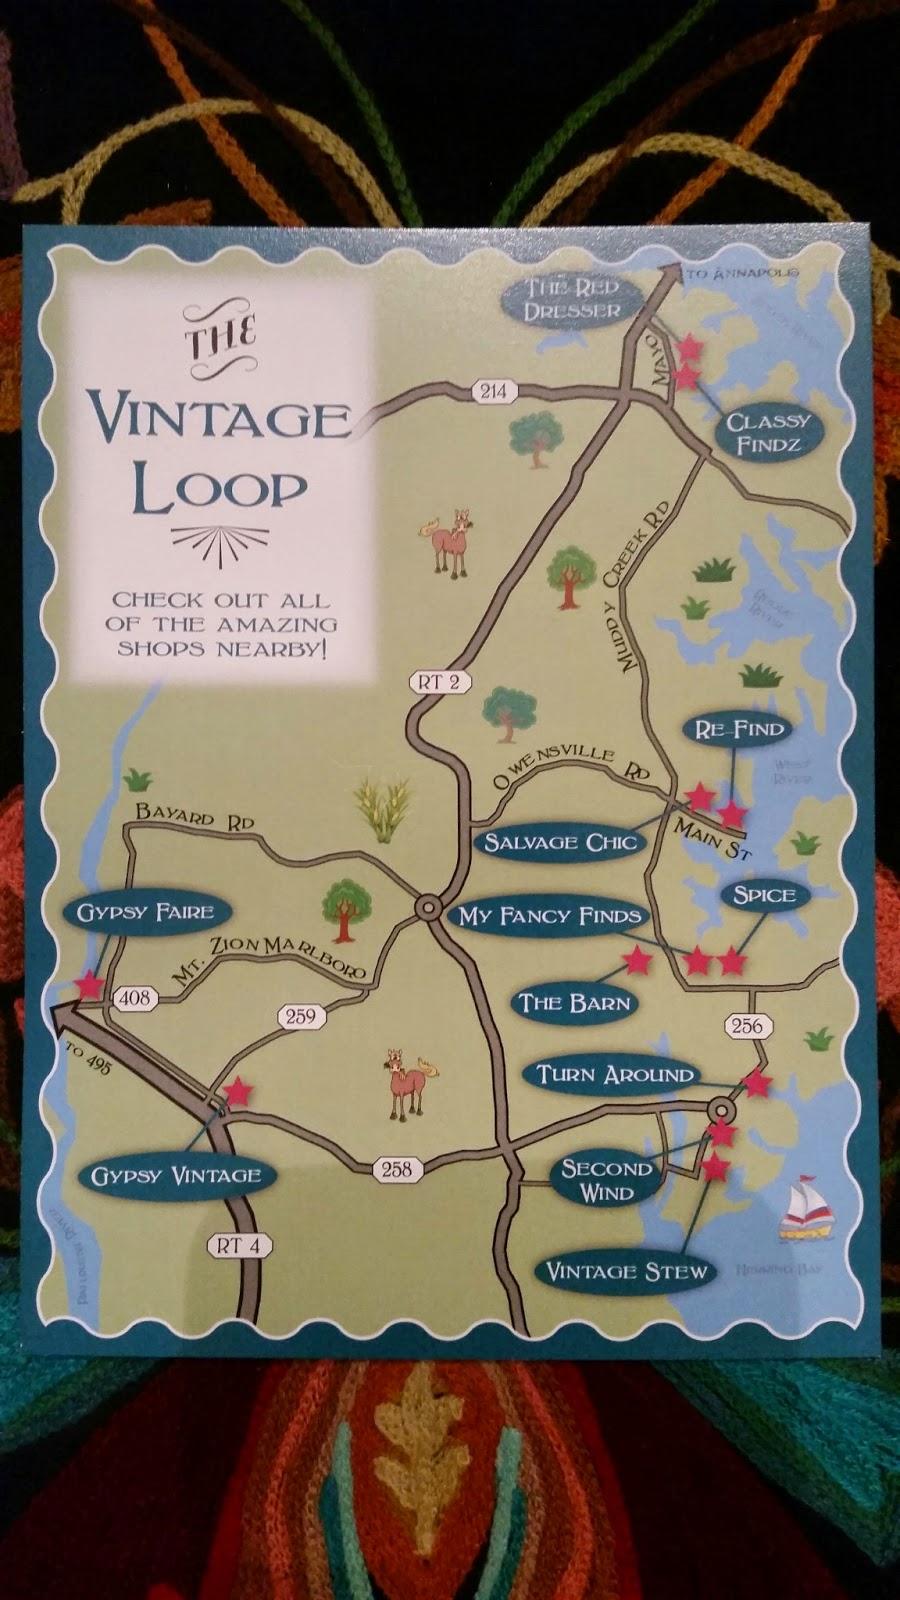 Chesapeake Bay Area Maryland The Vintage Loop